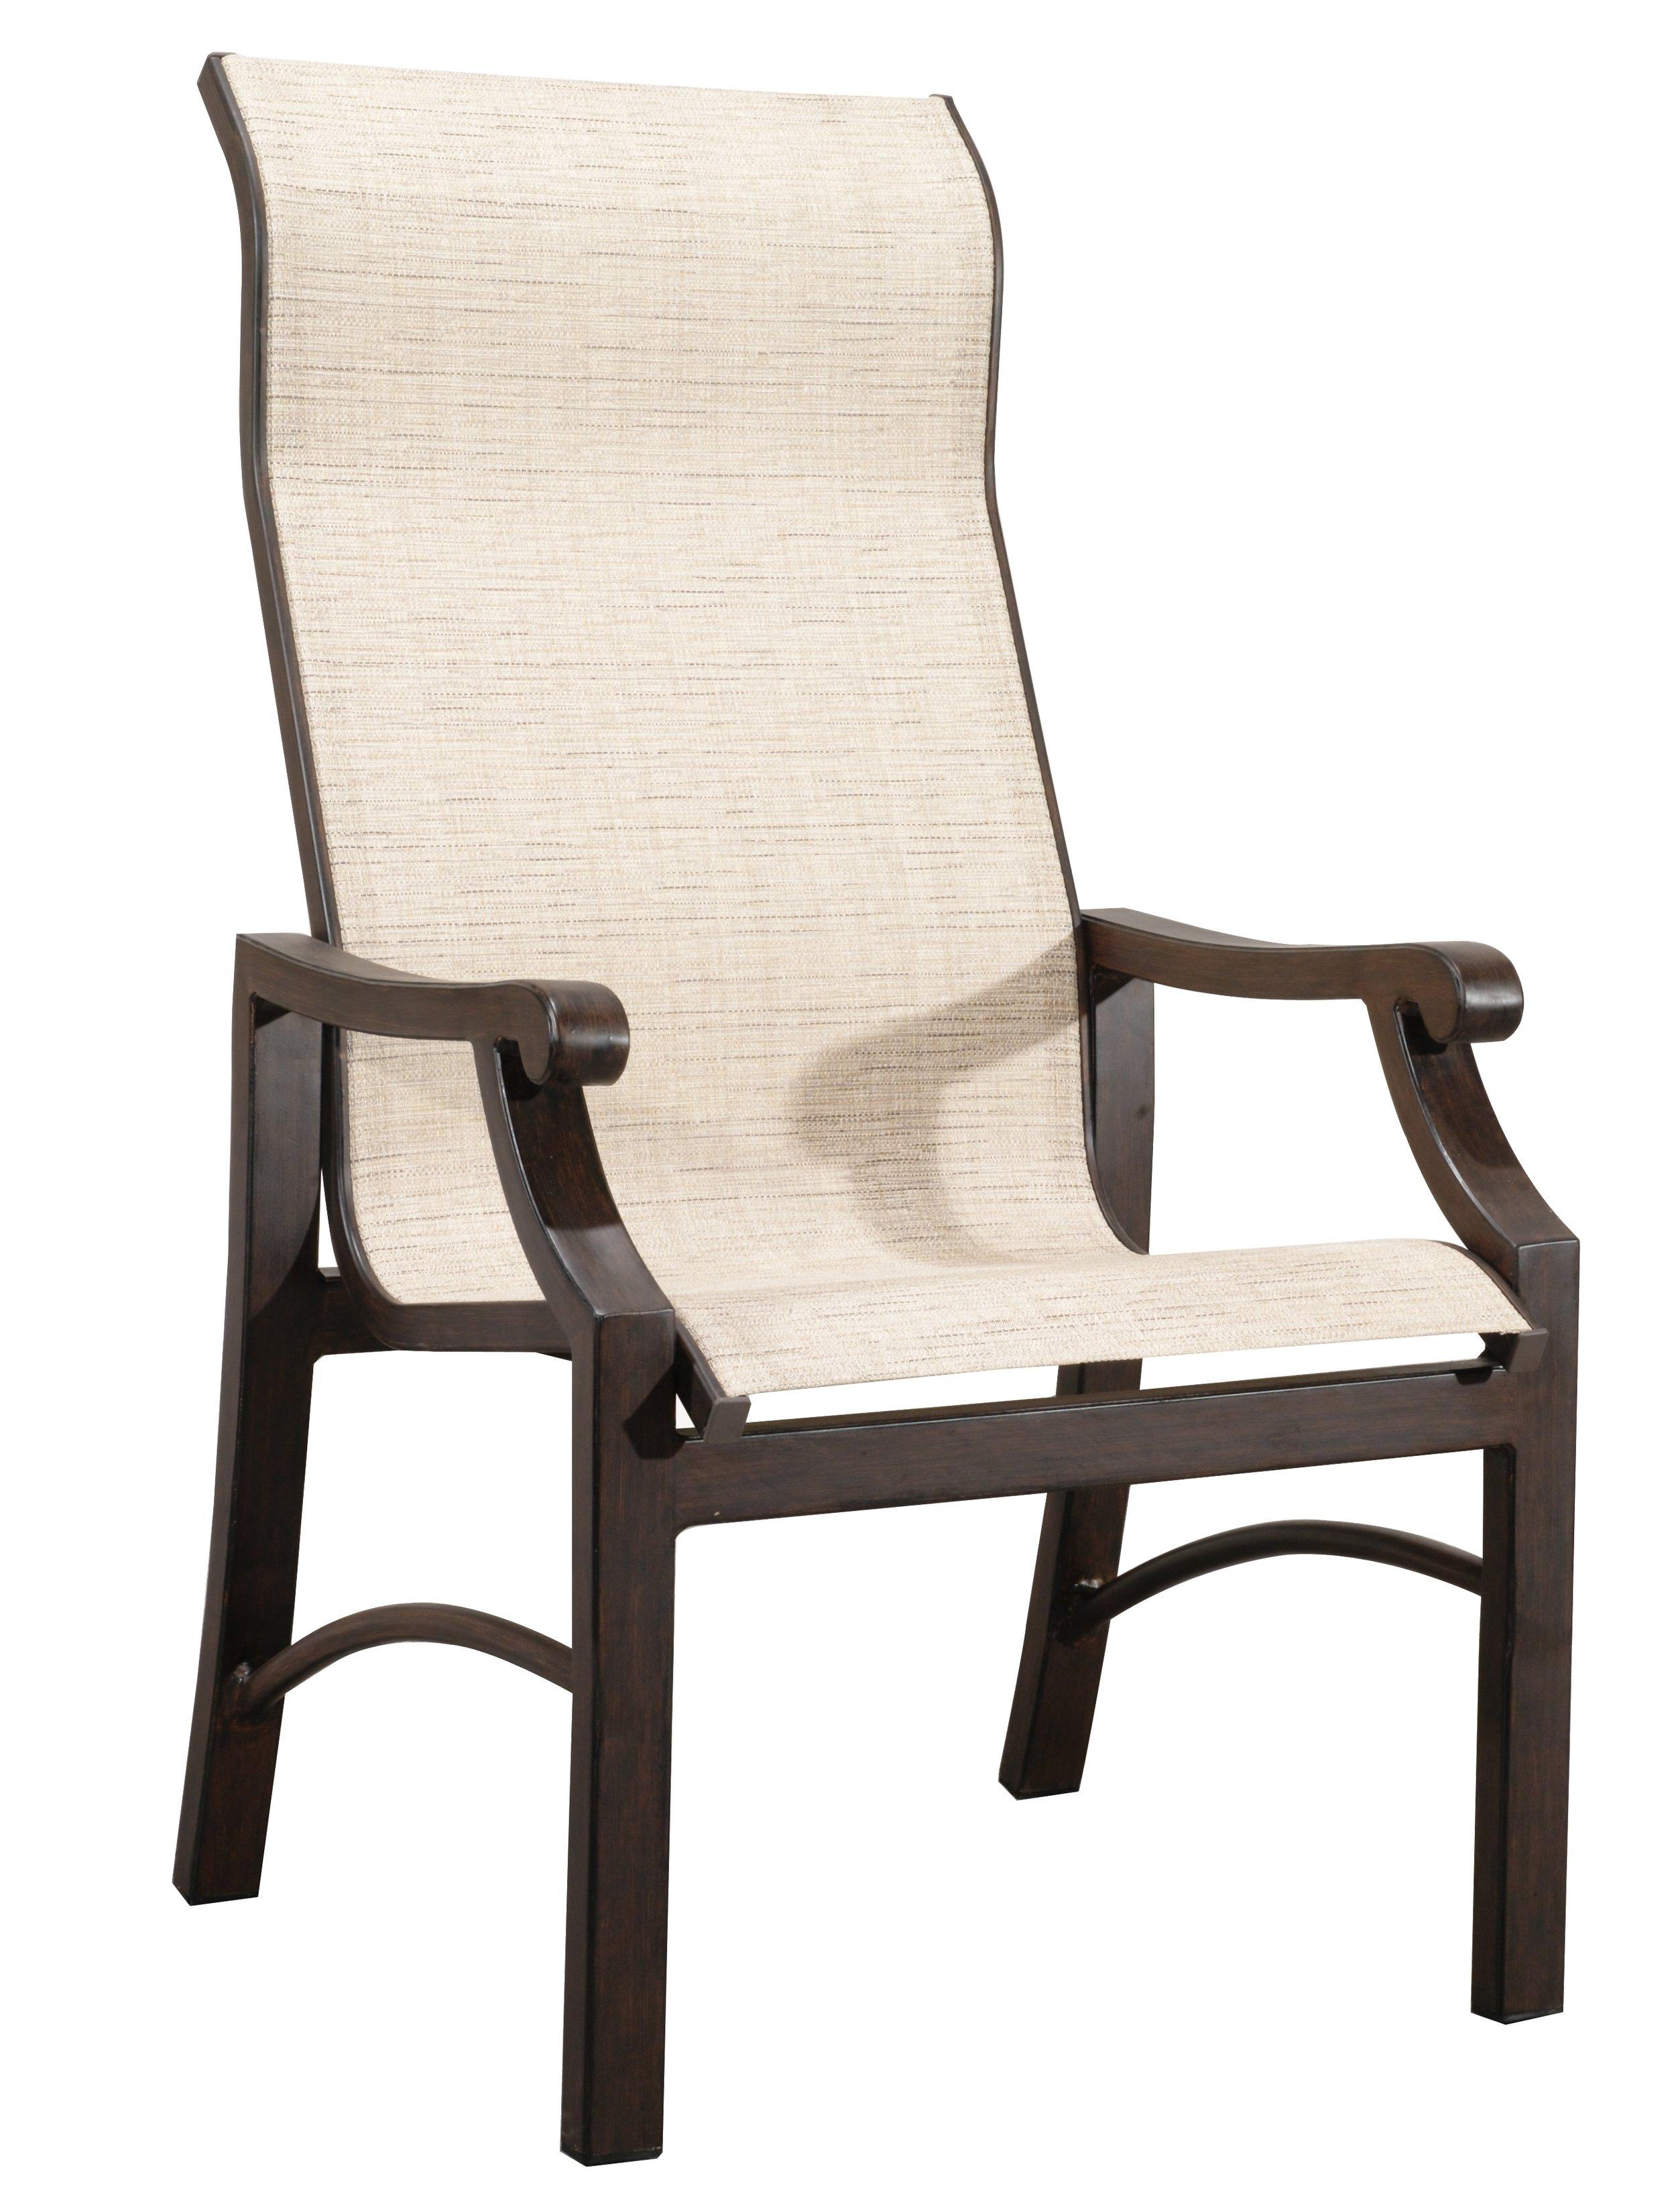 "970820 Venice Sling Dining Chair   27.4"" x 20"" x 42"""